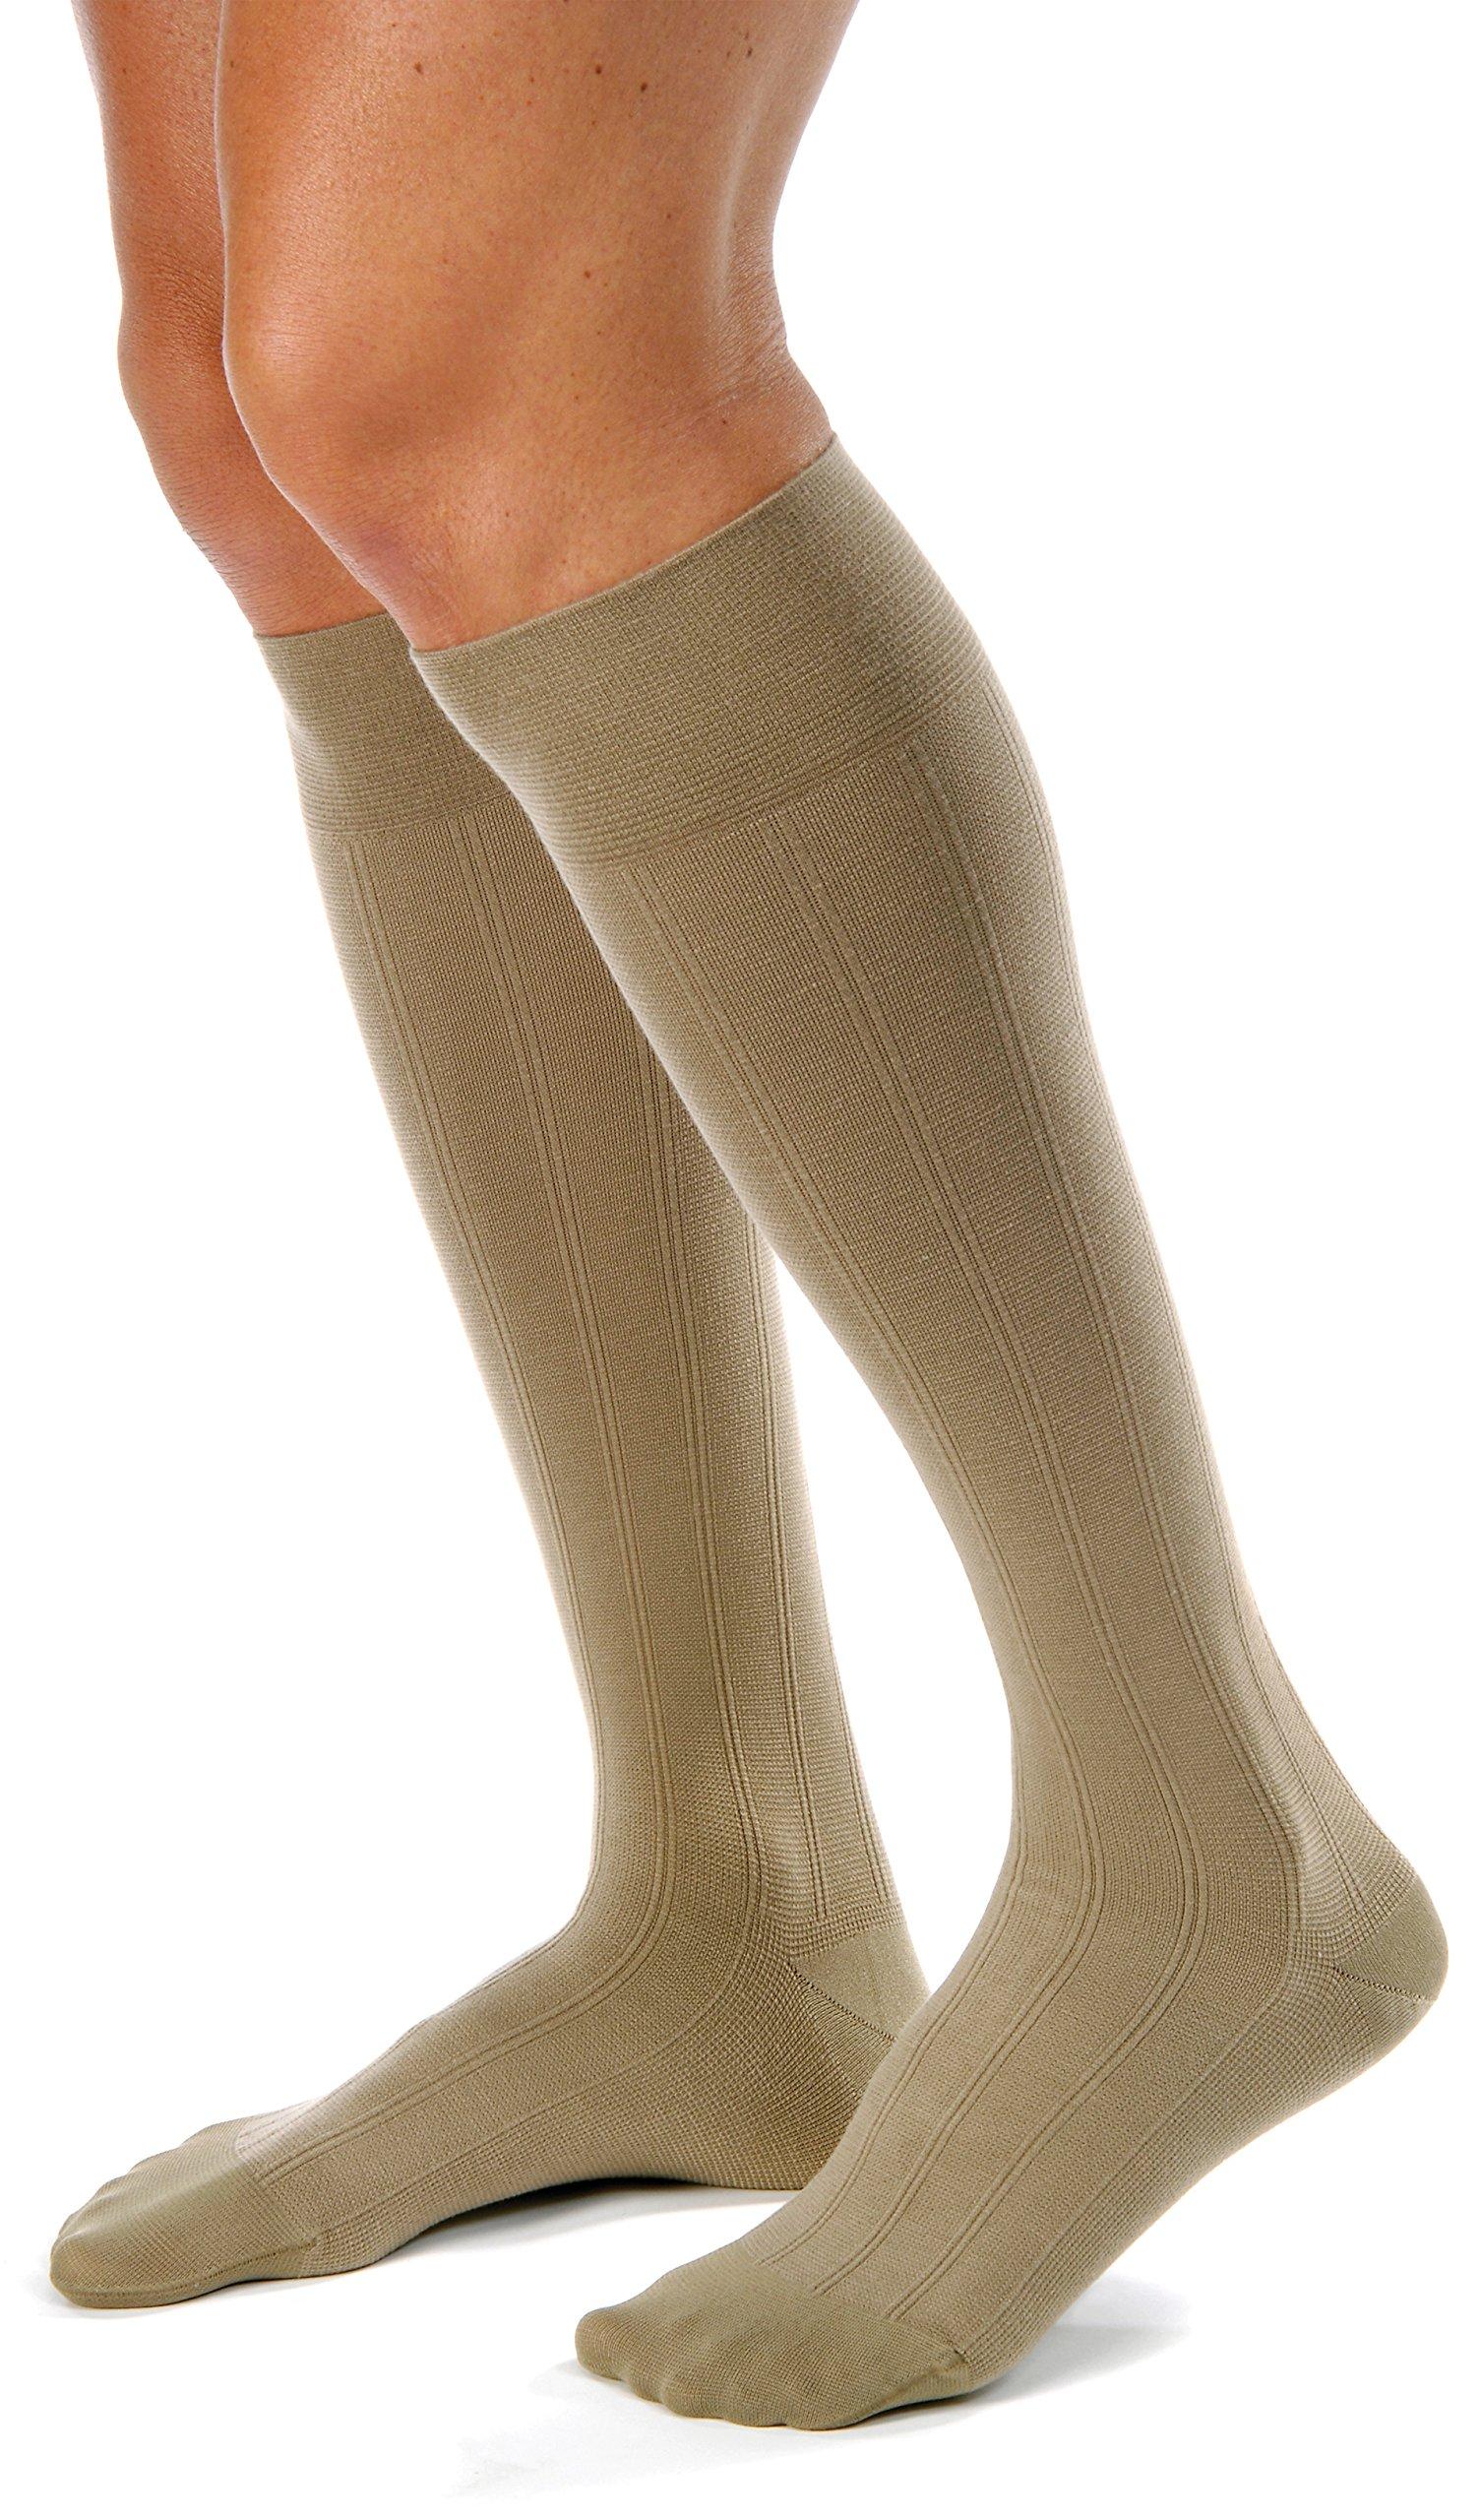 JOBST forMen Casual 20-30 mmHg Knee High Compression Socks, Khaki, Large Full Calf by JOBST